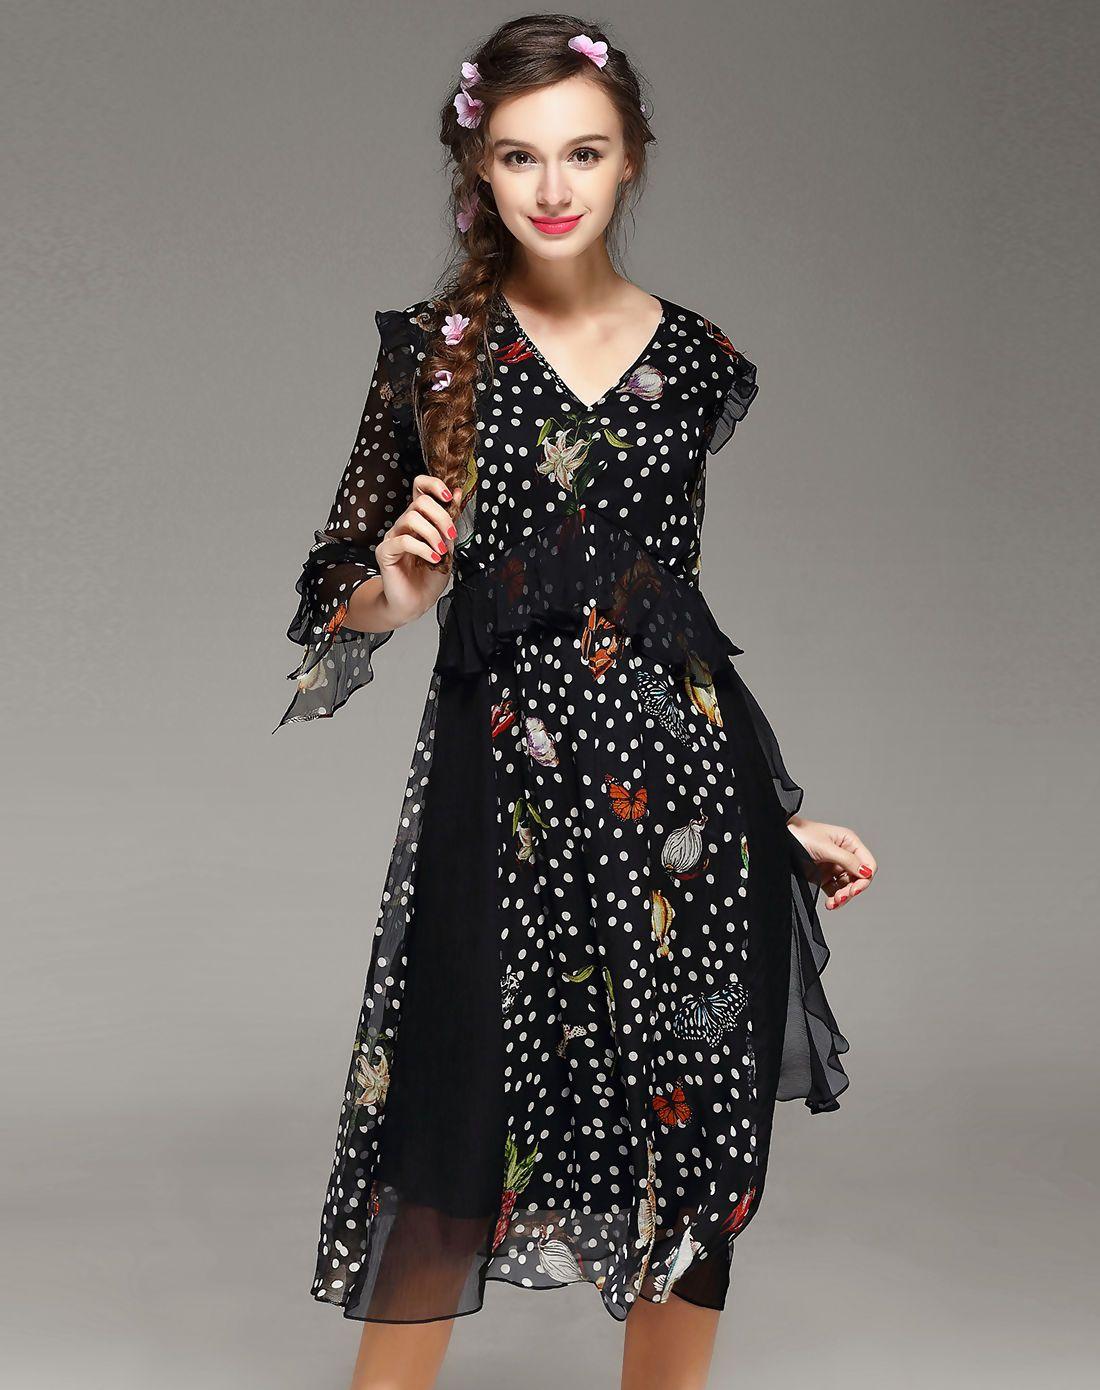 #AdoreWe #VIPme A-Line Dresses - wei guo yue Black Silk V Neck Printed Ruffled Midi Dress - AdoreWe.com